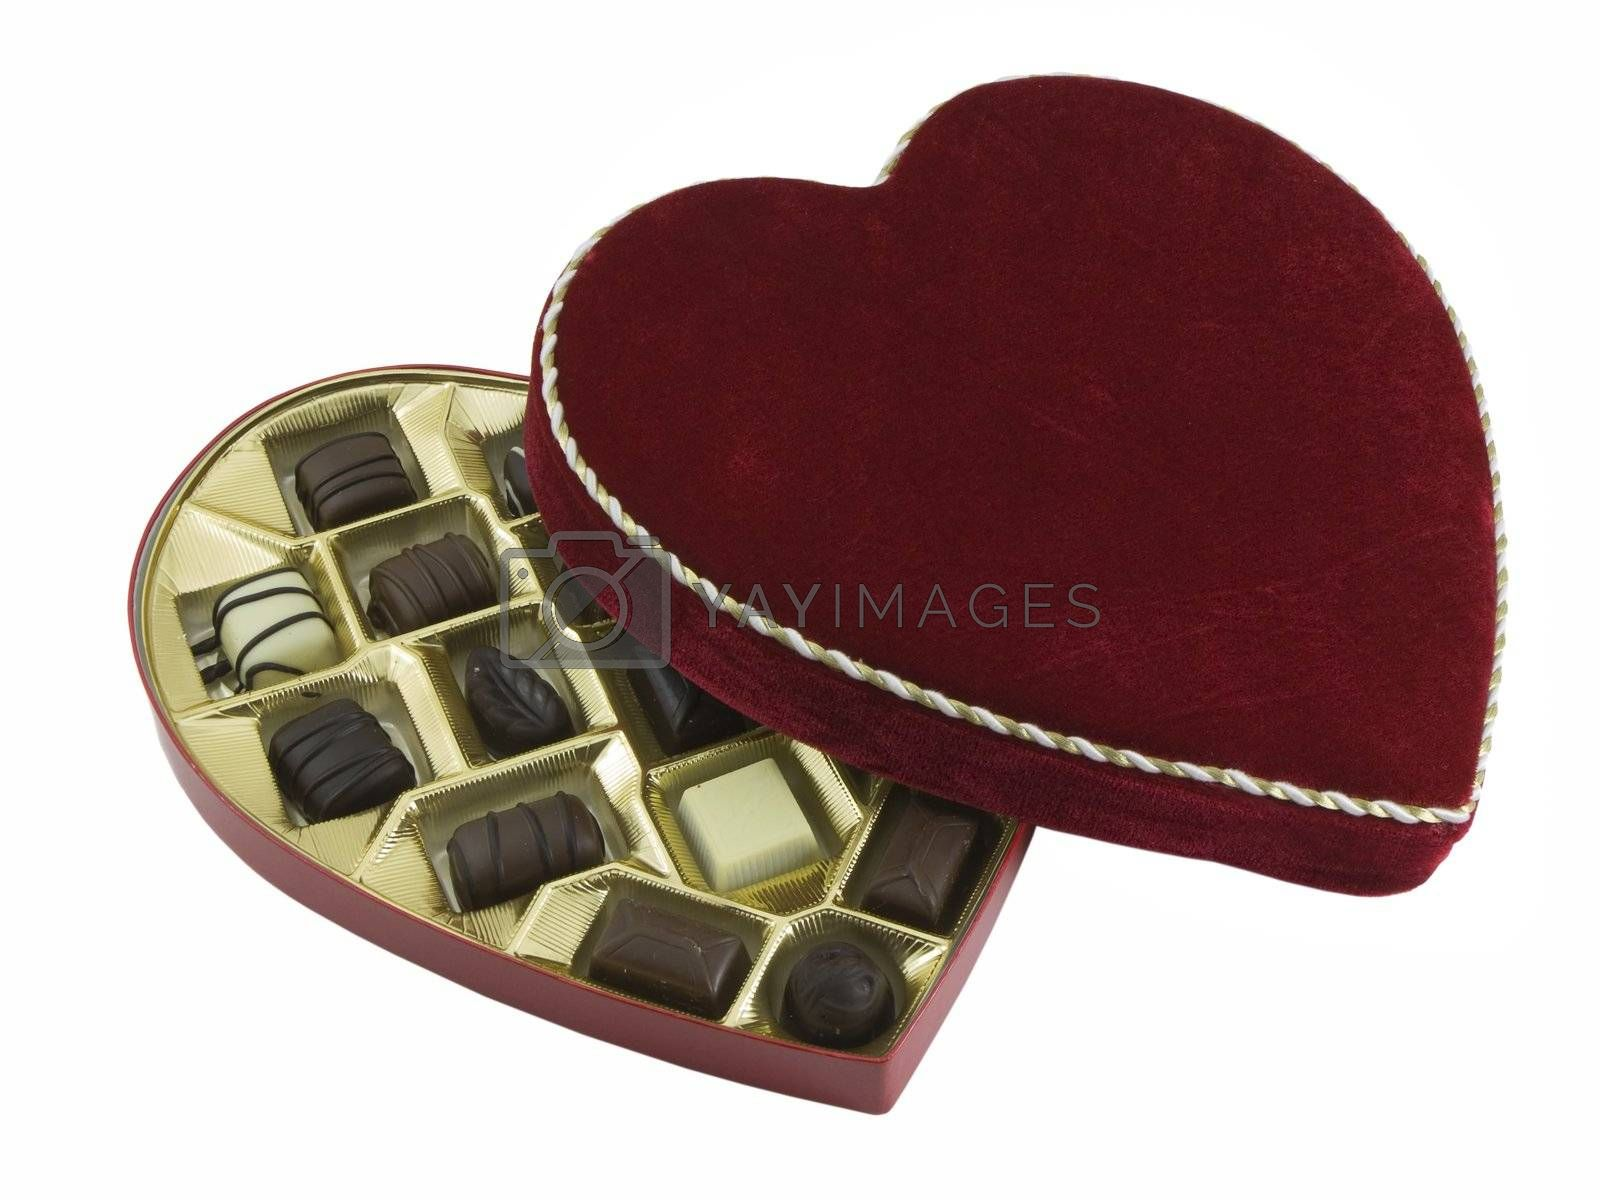 Opened box of valentines chocolates isolated on white